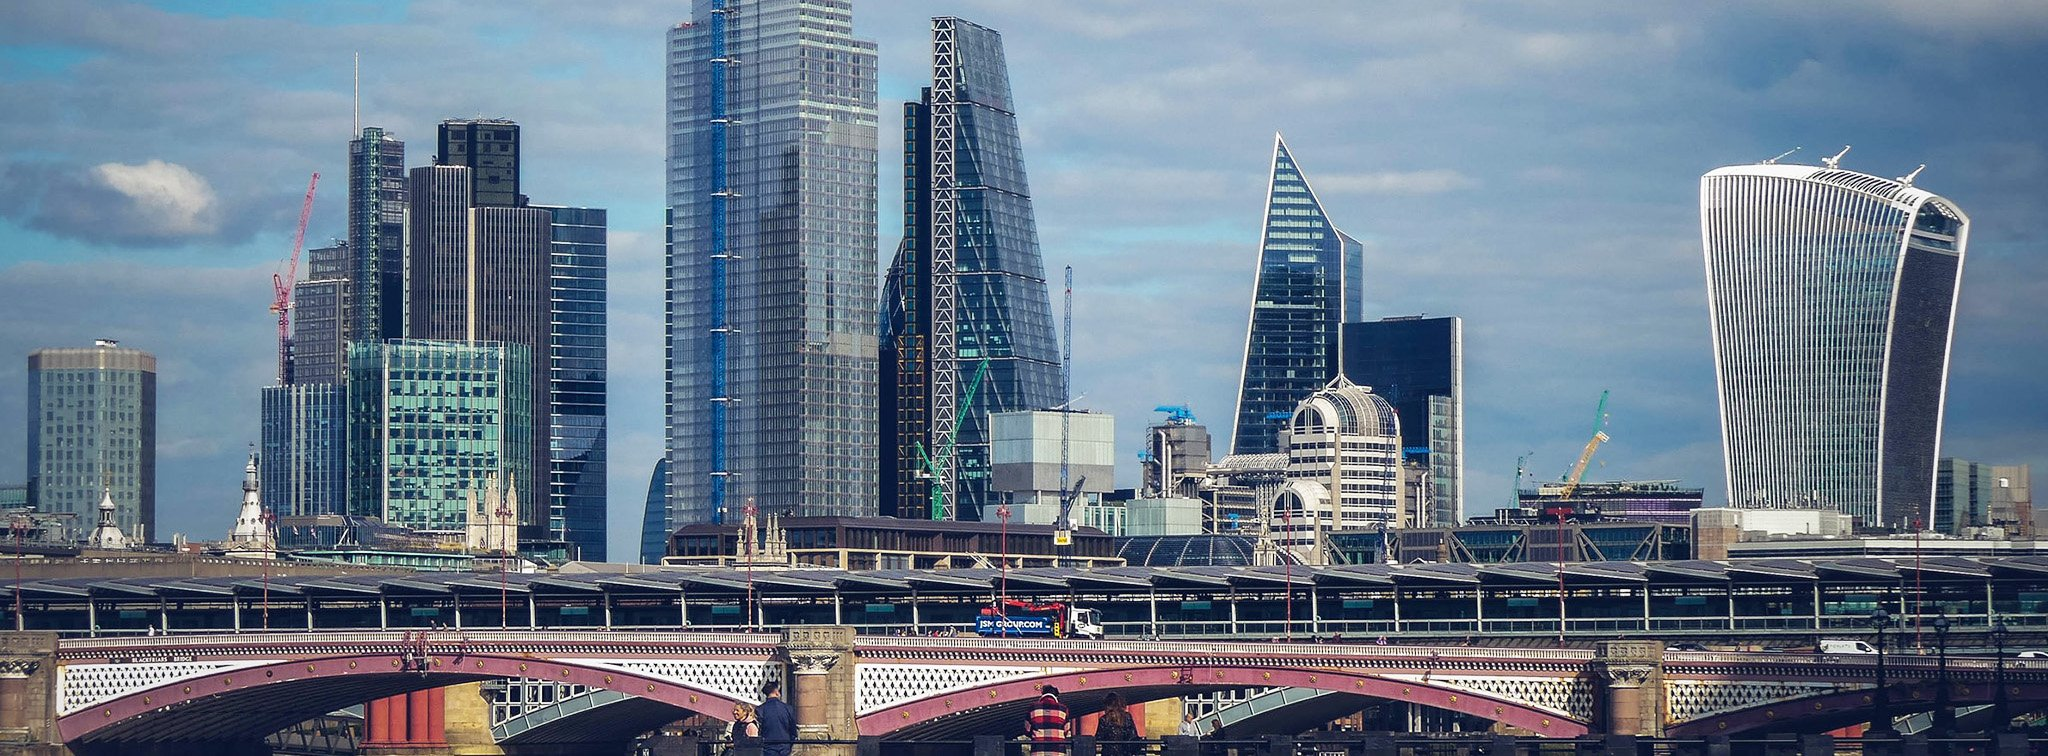 Zero Carbon - London tall buildings